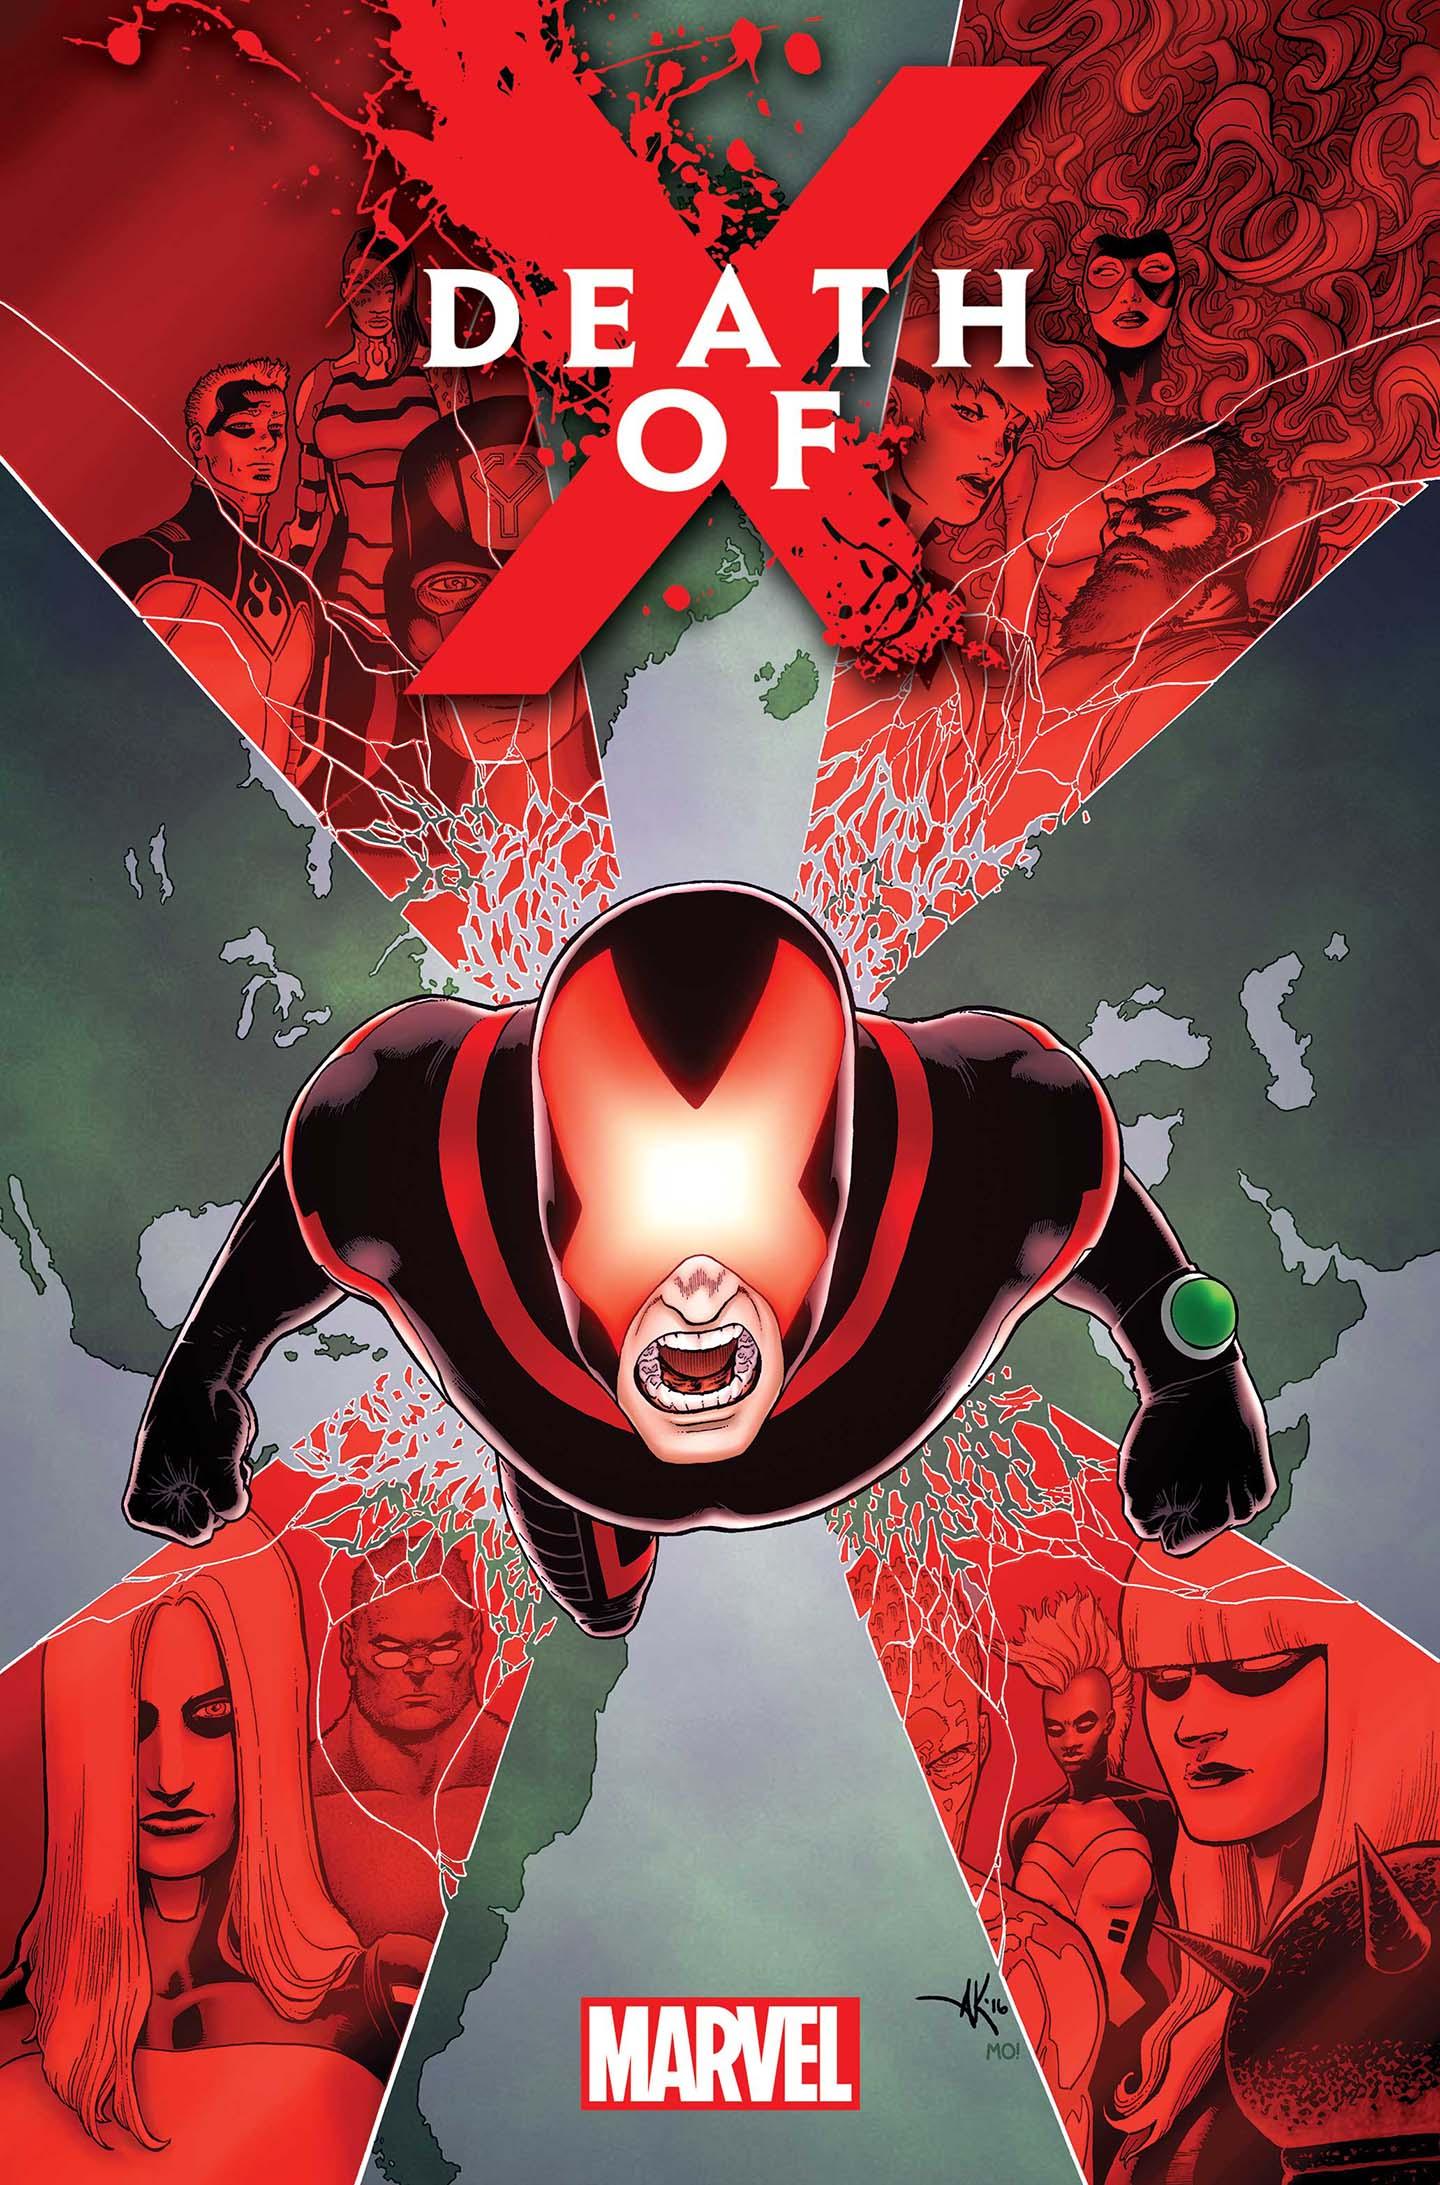 Marvel Brings Us Death of X